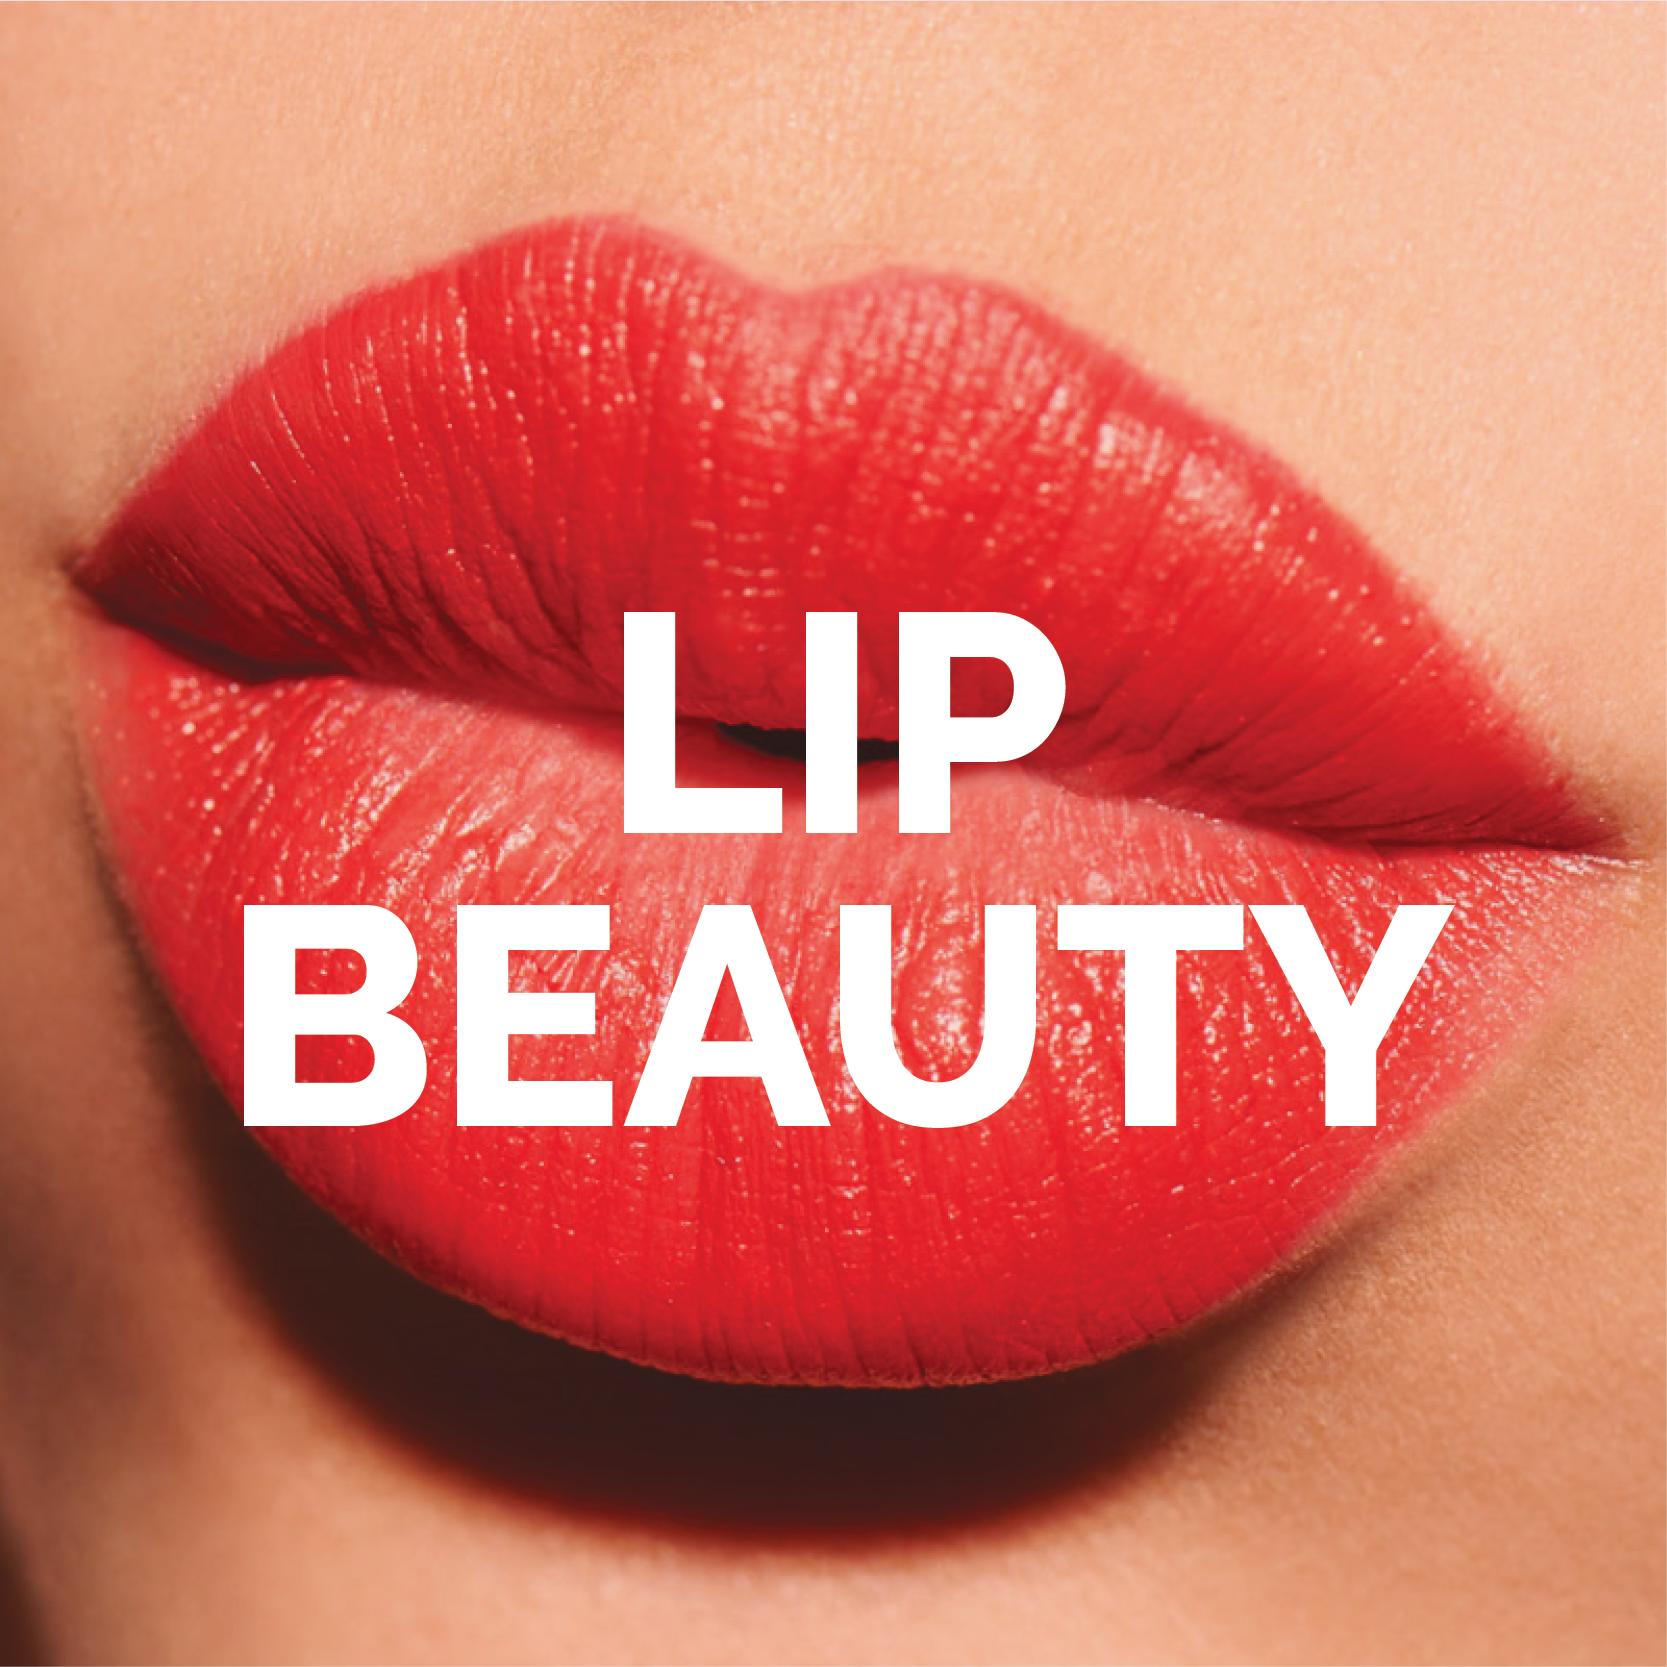 Lip beauty